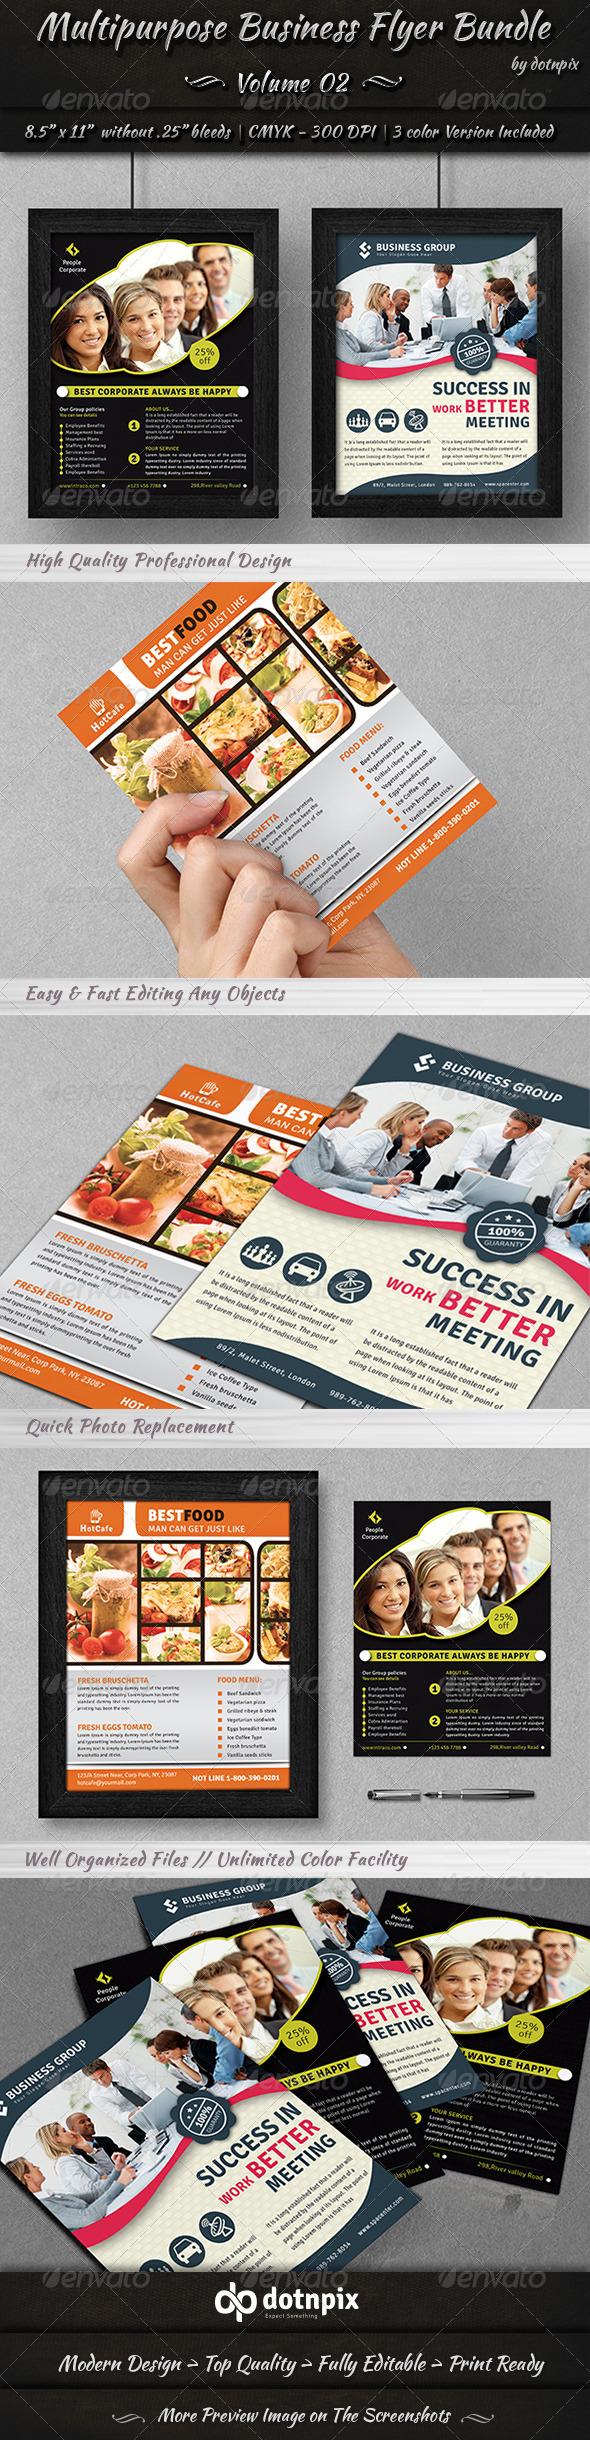 GraphicRiver Multipurpose Business Flyer Bundle Volume 2 7000573